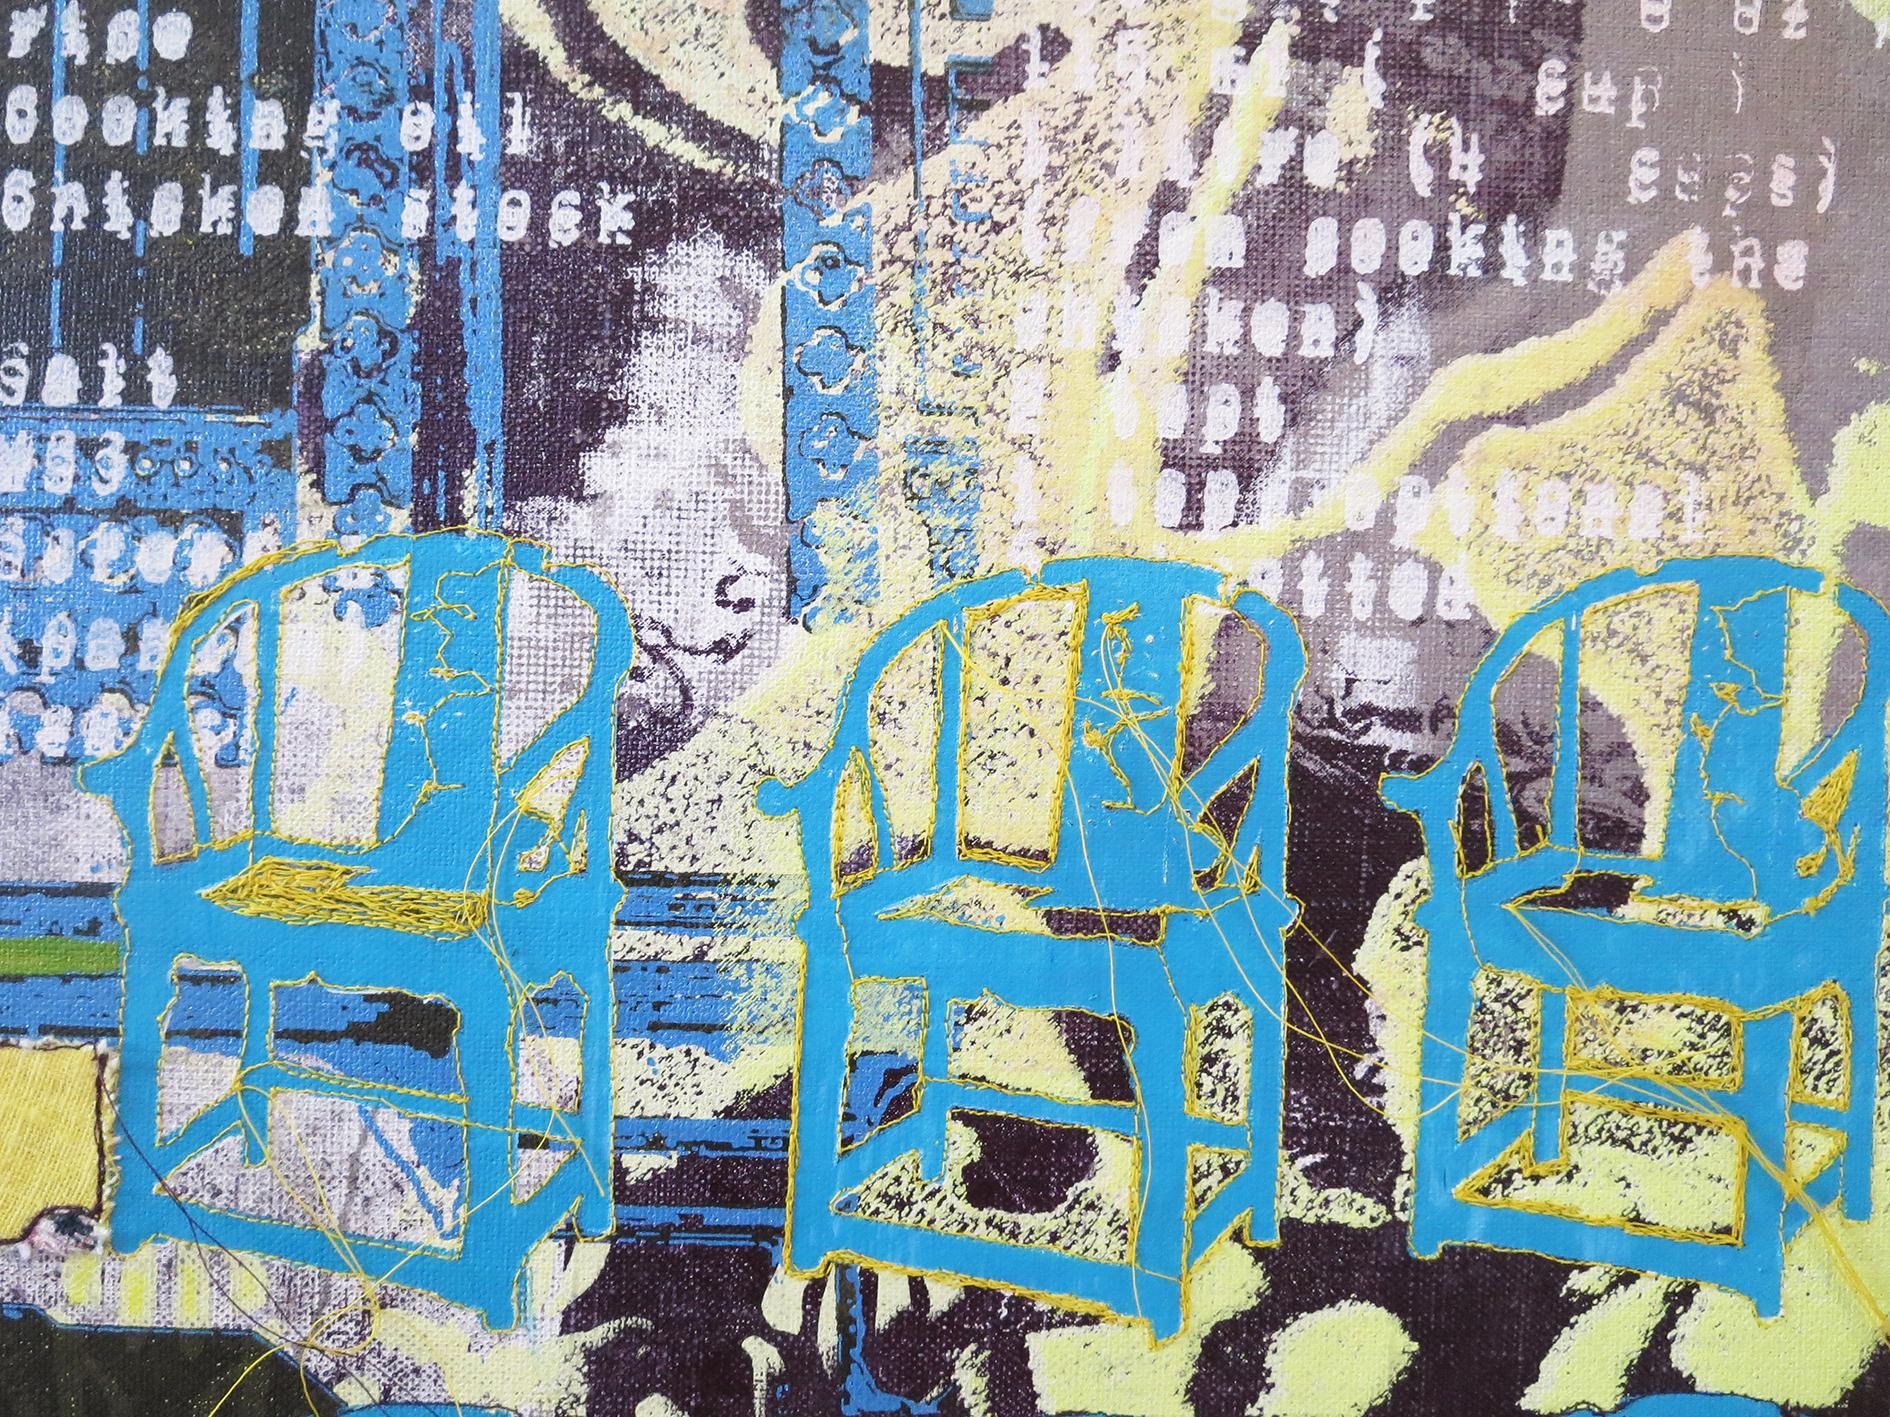 Grandma's Antique Chair Close-Up4_RGB_low.jpg